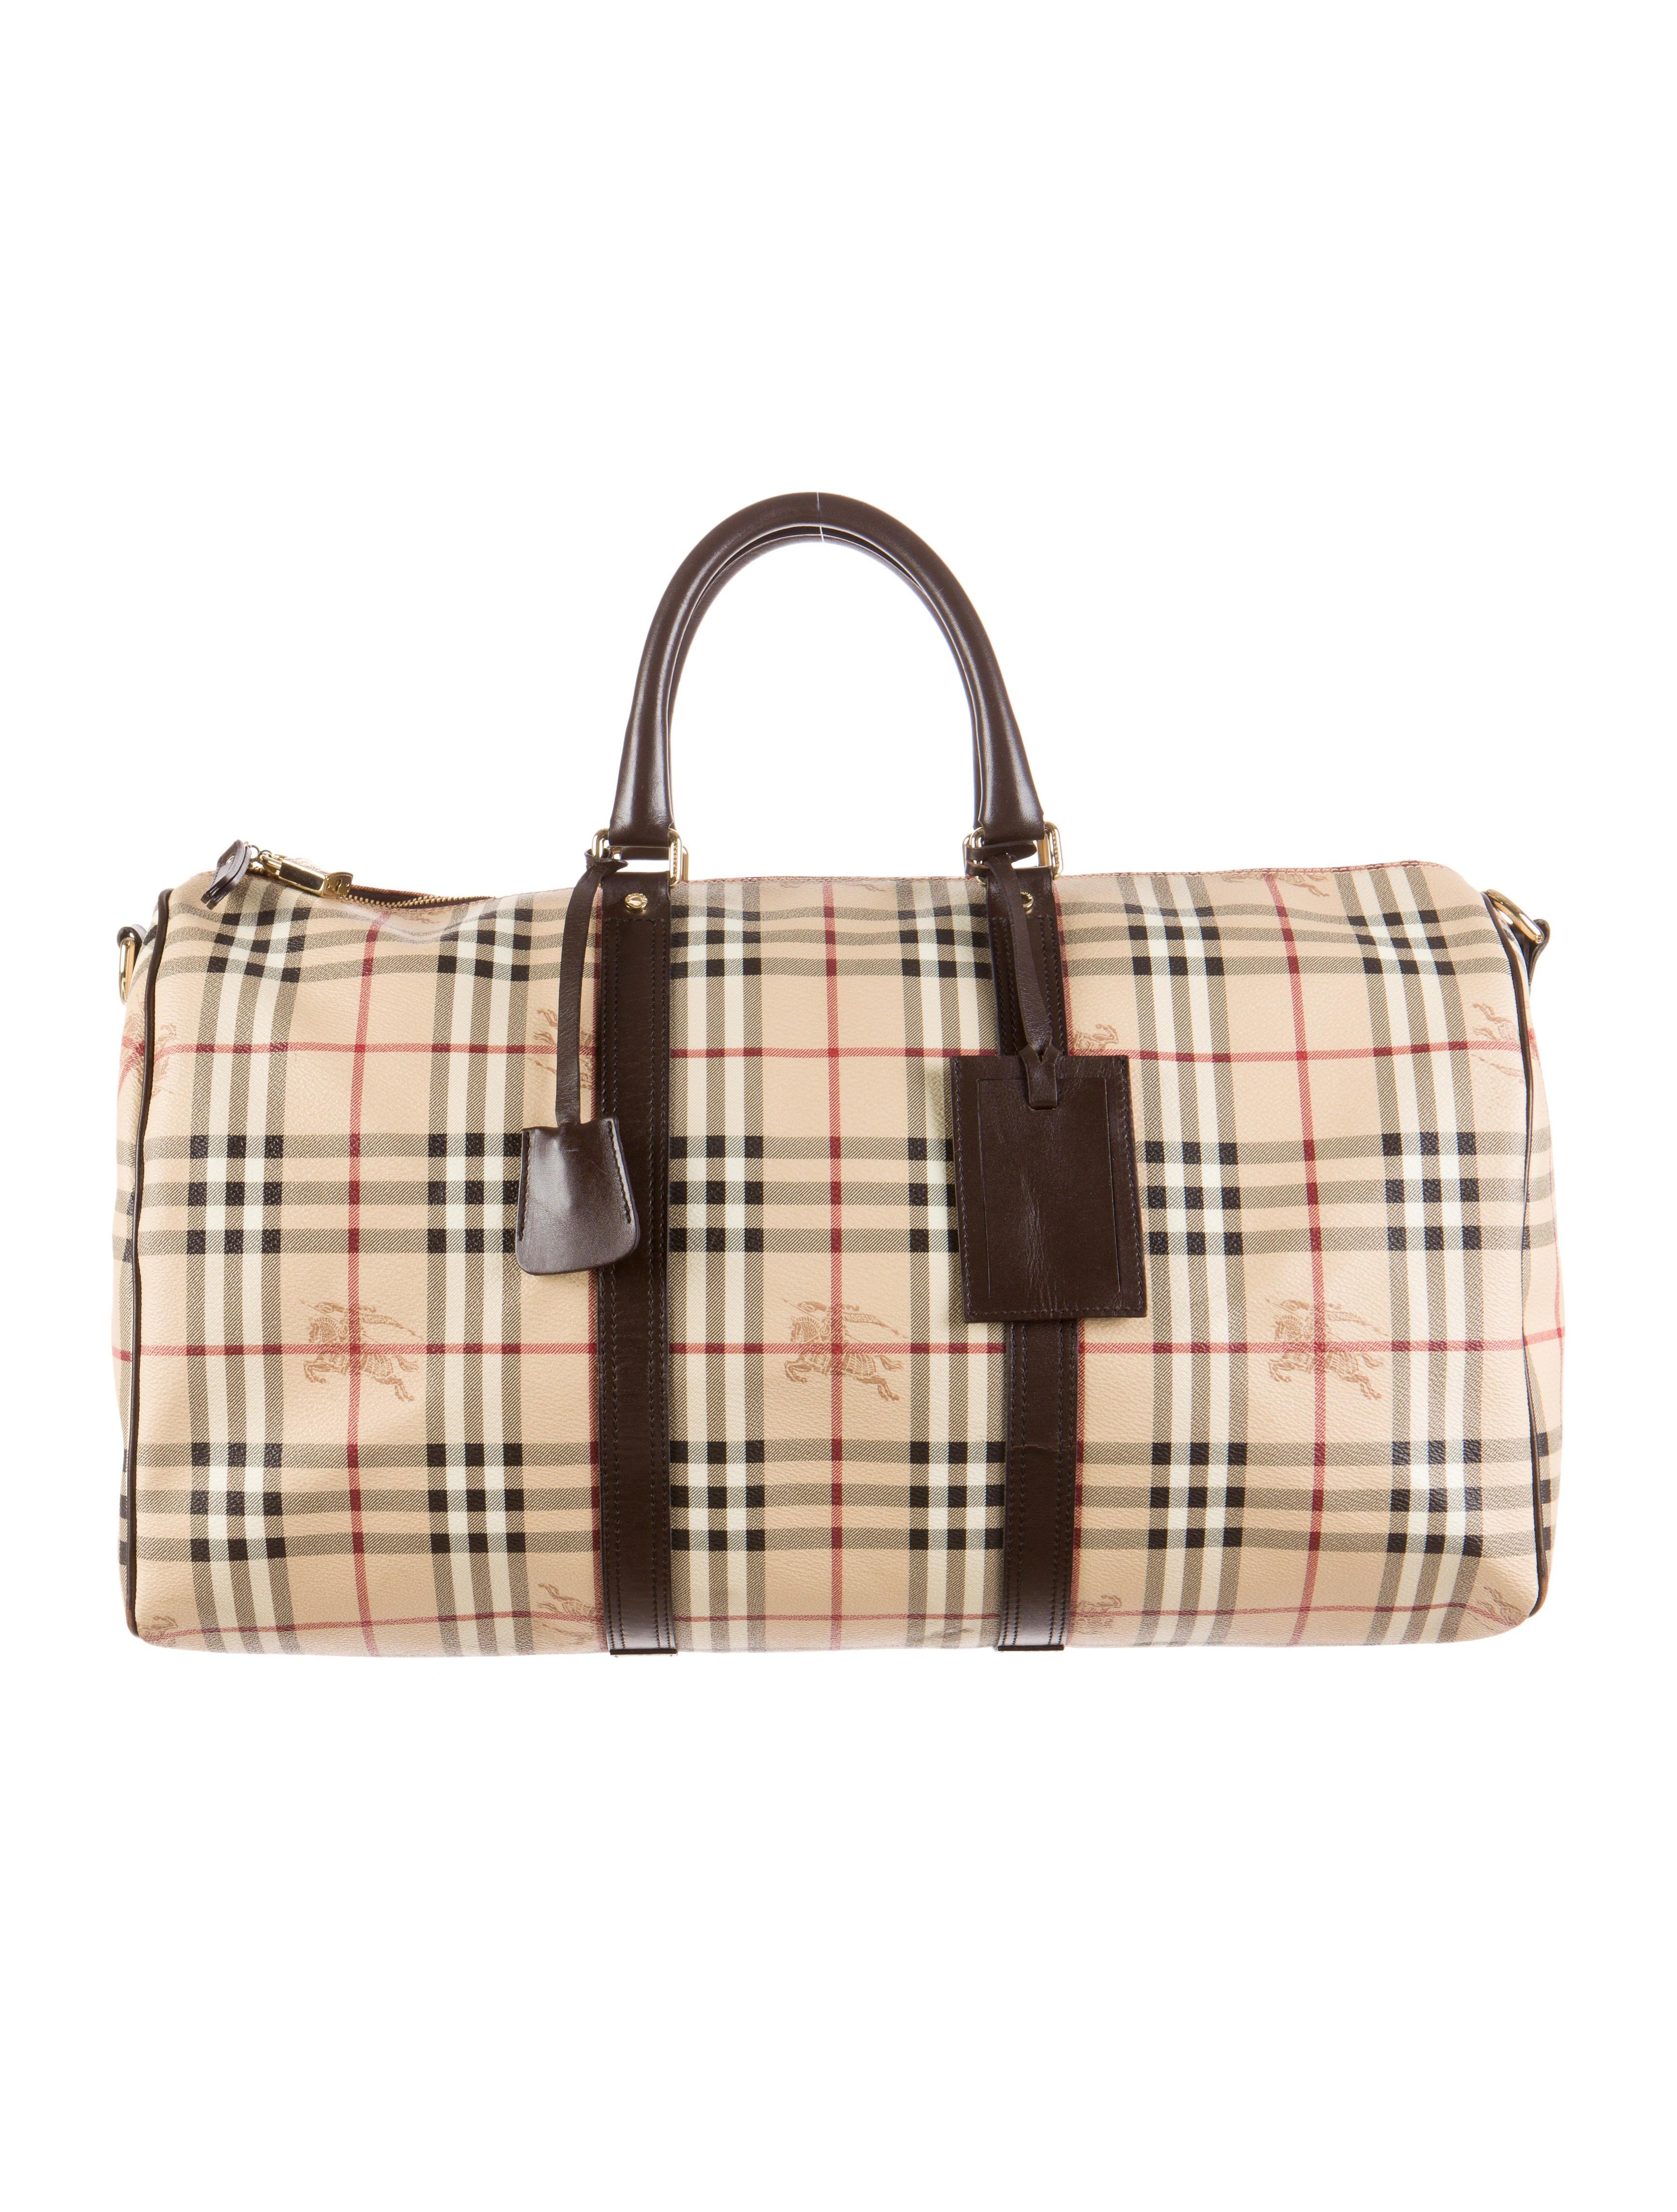 Burberry Haymarket Duffle Bag - Bags - BUR40812   The RealReal 5906f090f5